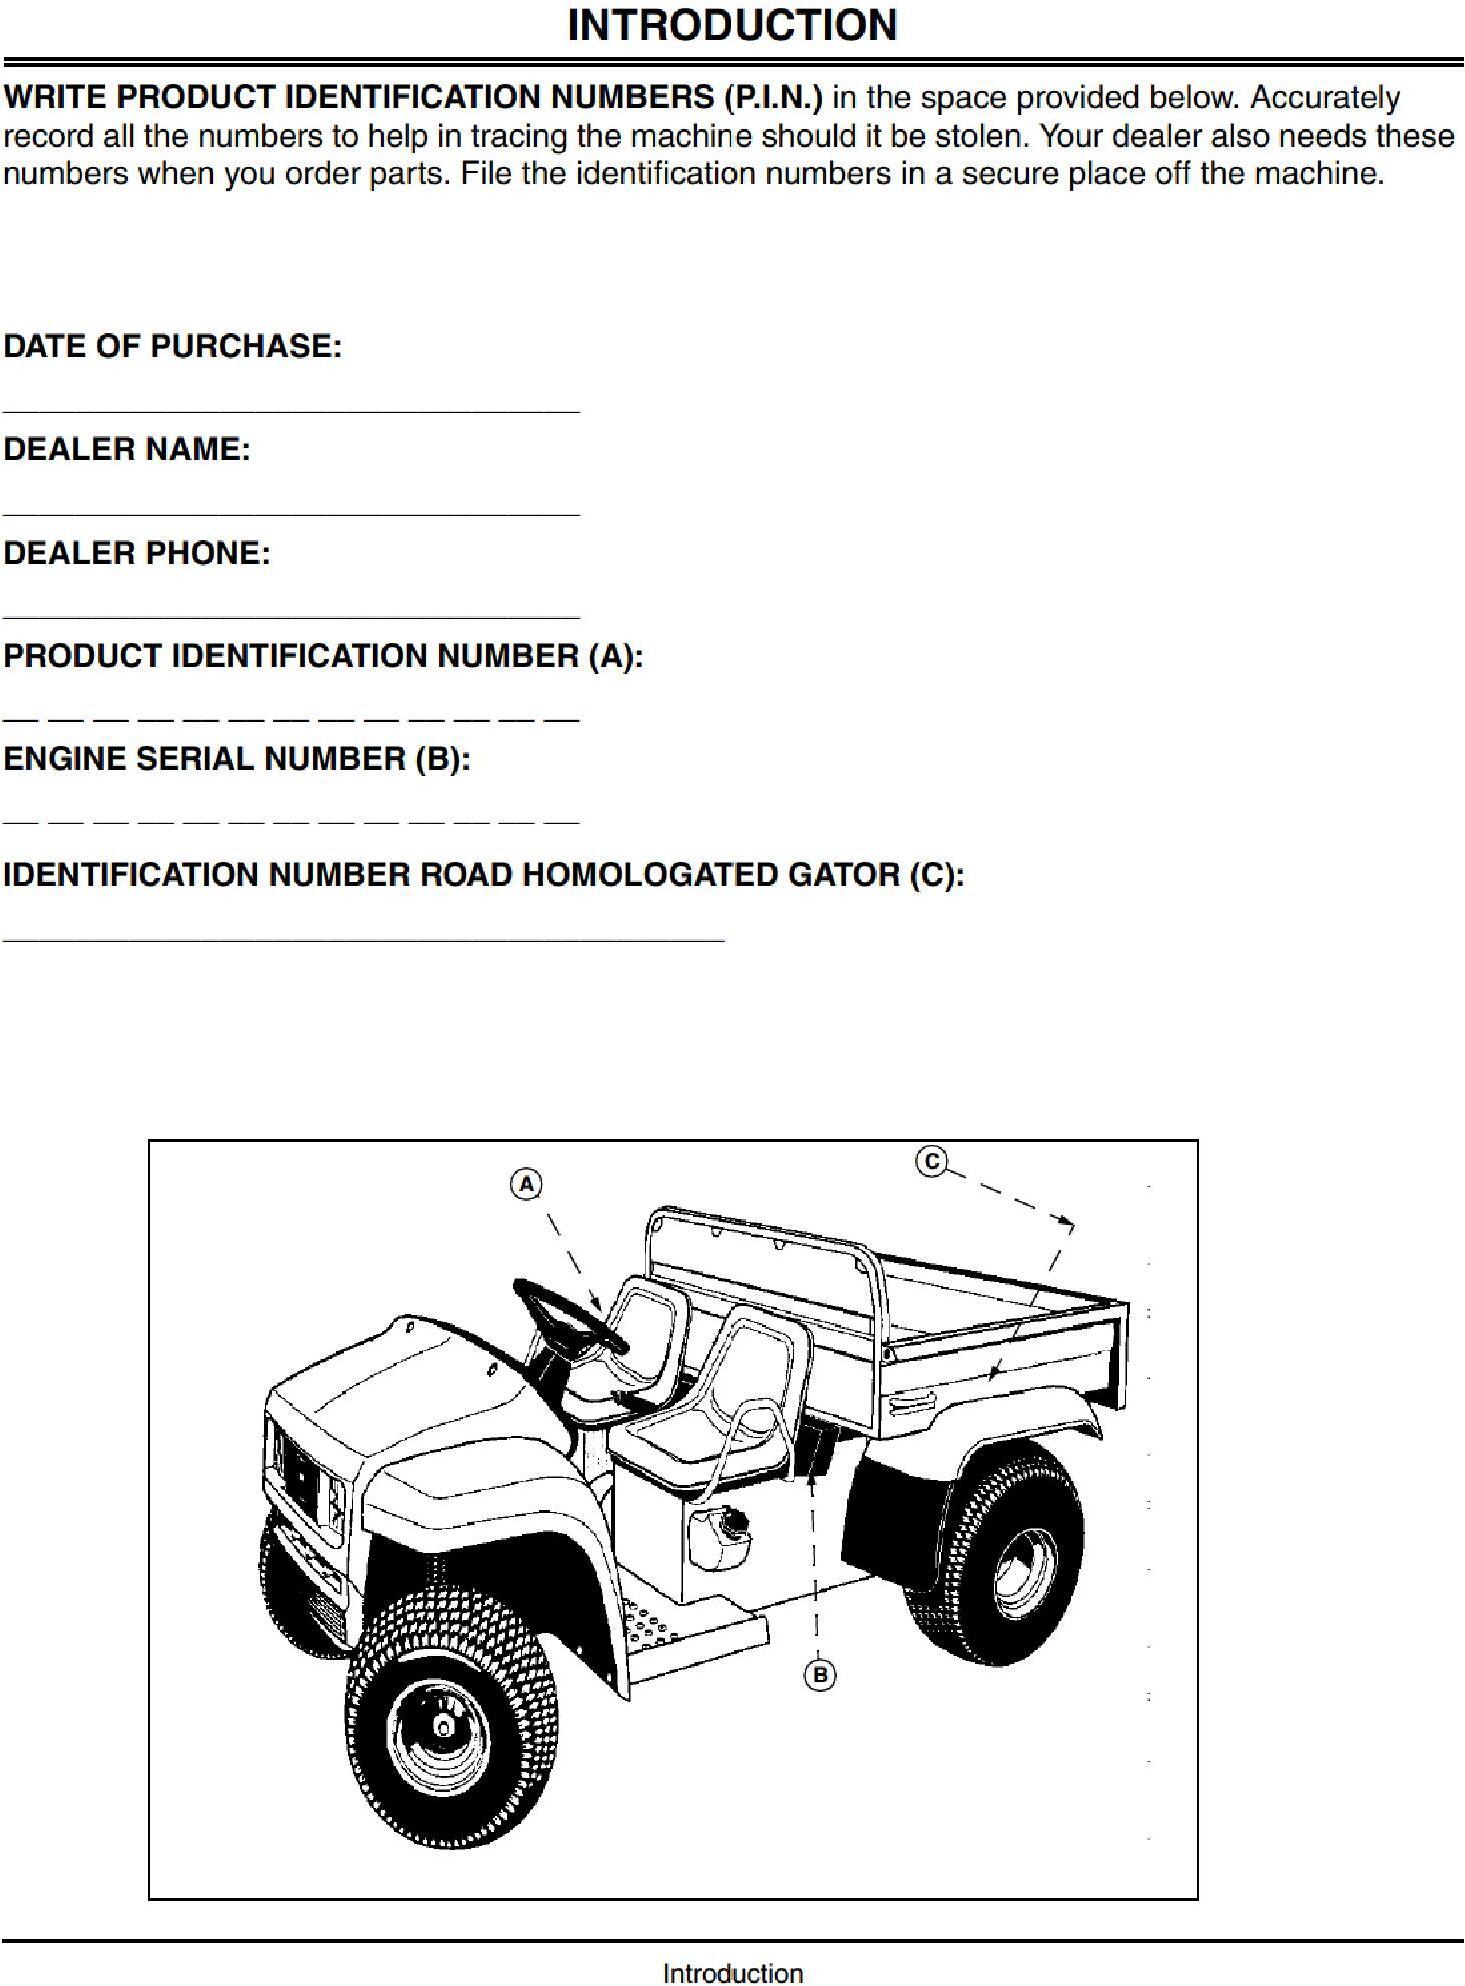 OMM136970 - John Deere 4x2, 6x4 Gator Trail Utility Vehicles Operators Manual - 1